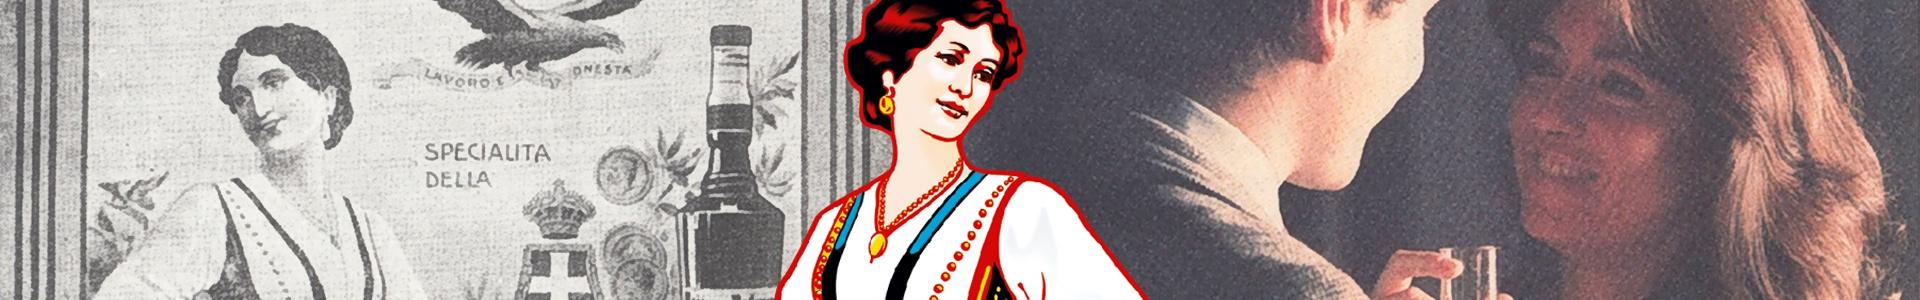 Amaro Lucano history image